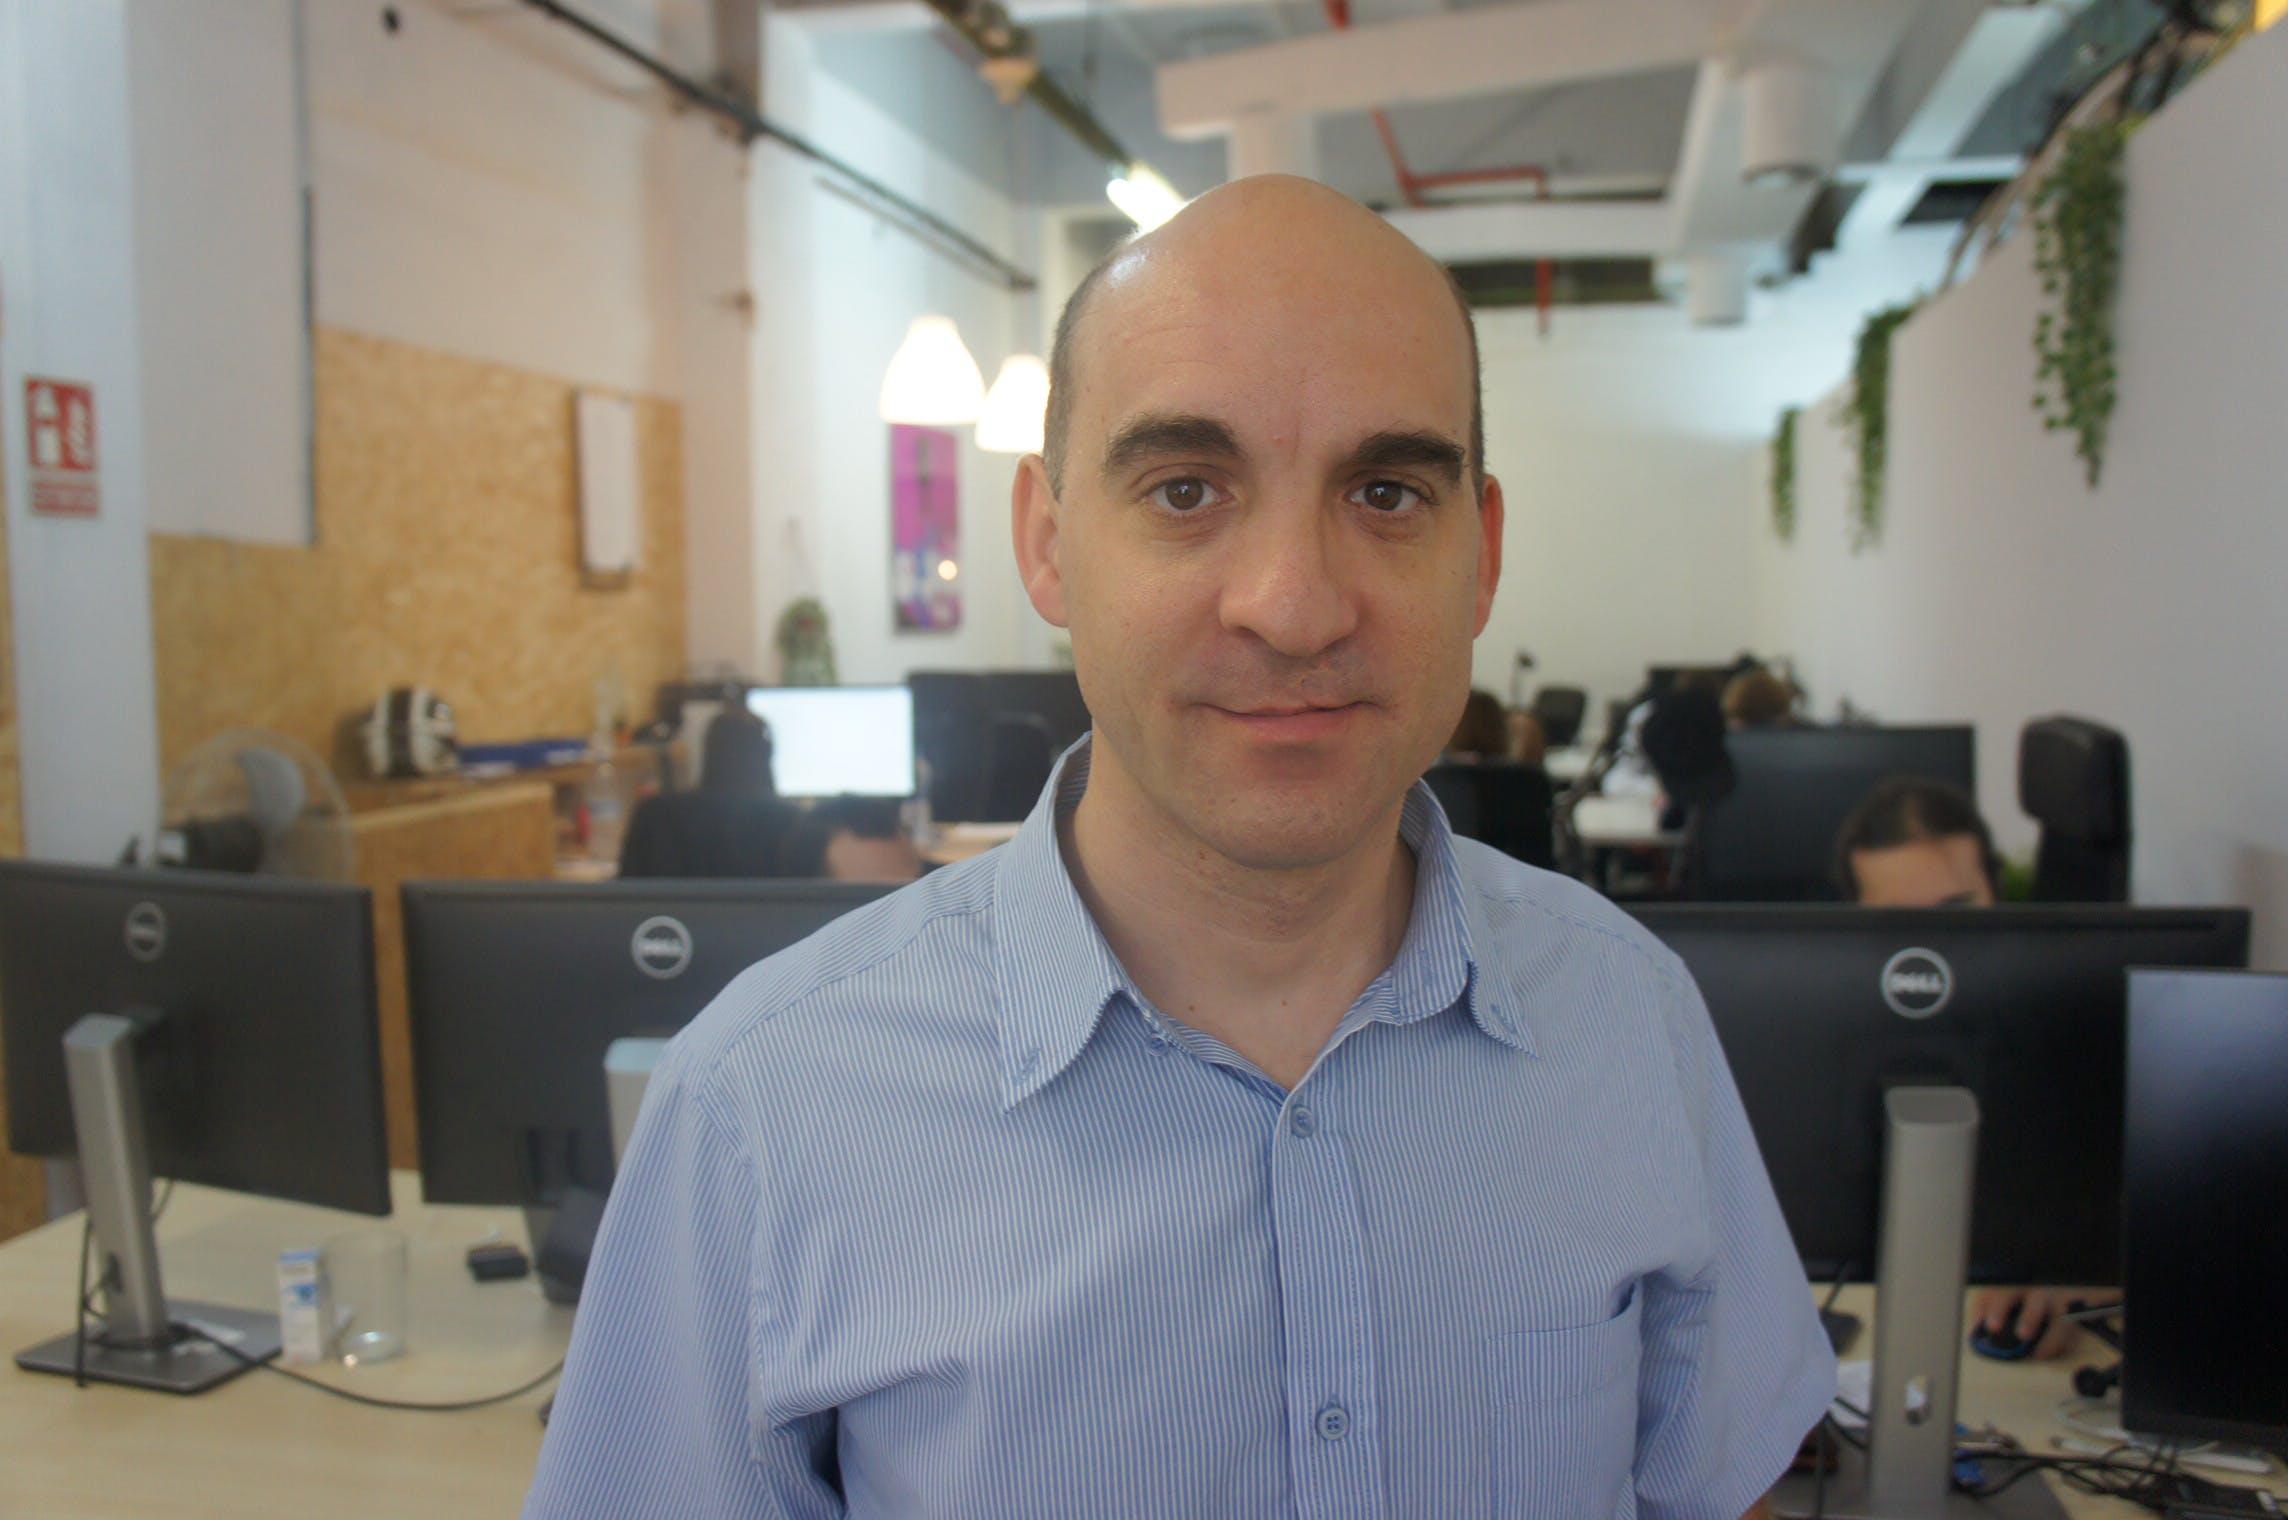 Ironhack Data Analytics instructor Ignacio Soteras